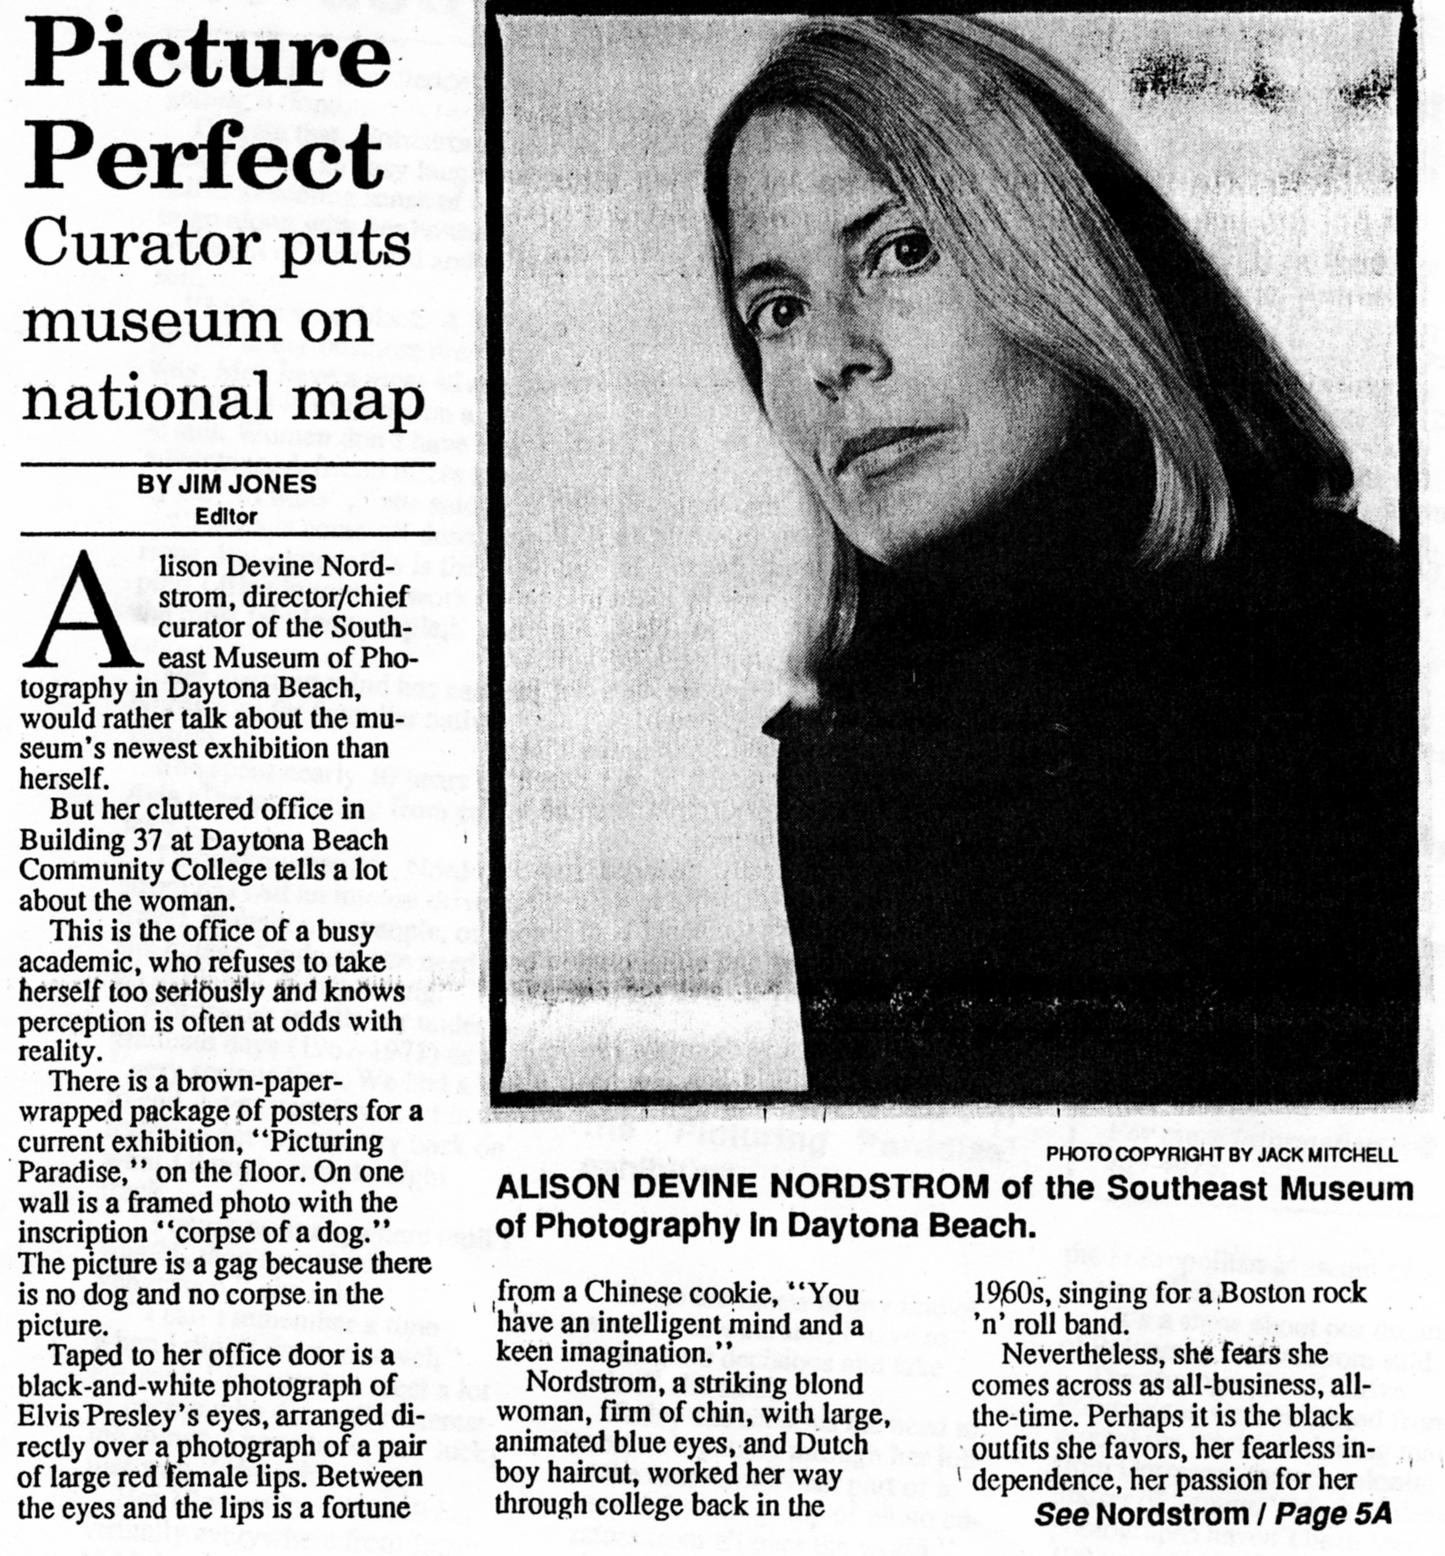 Nordstrom interview, Daytona Beach News Journal, 1992